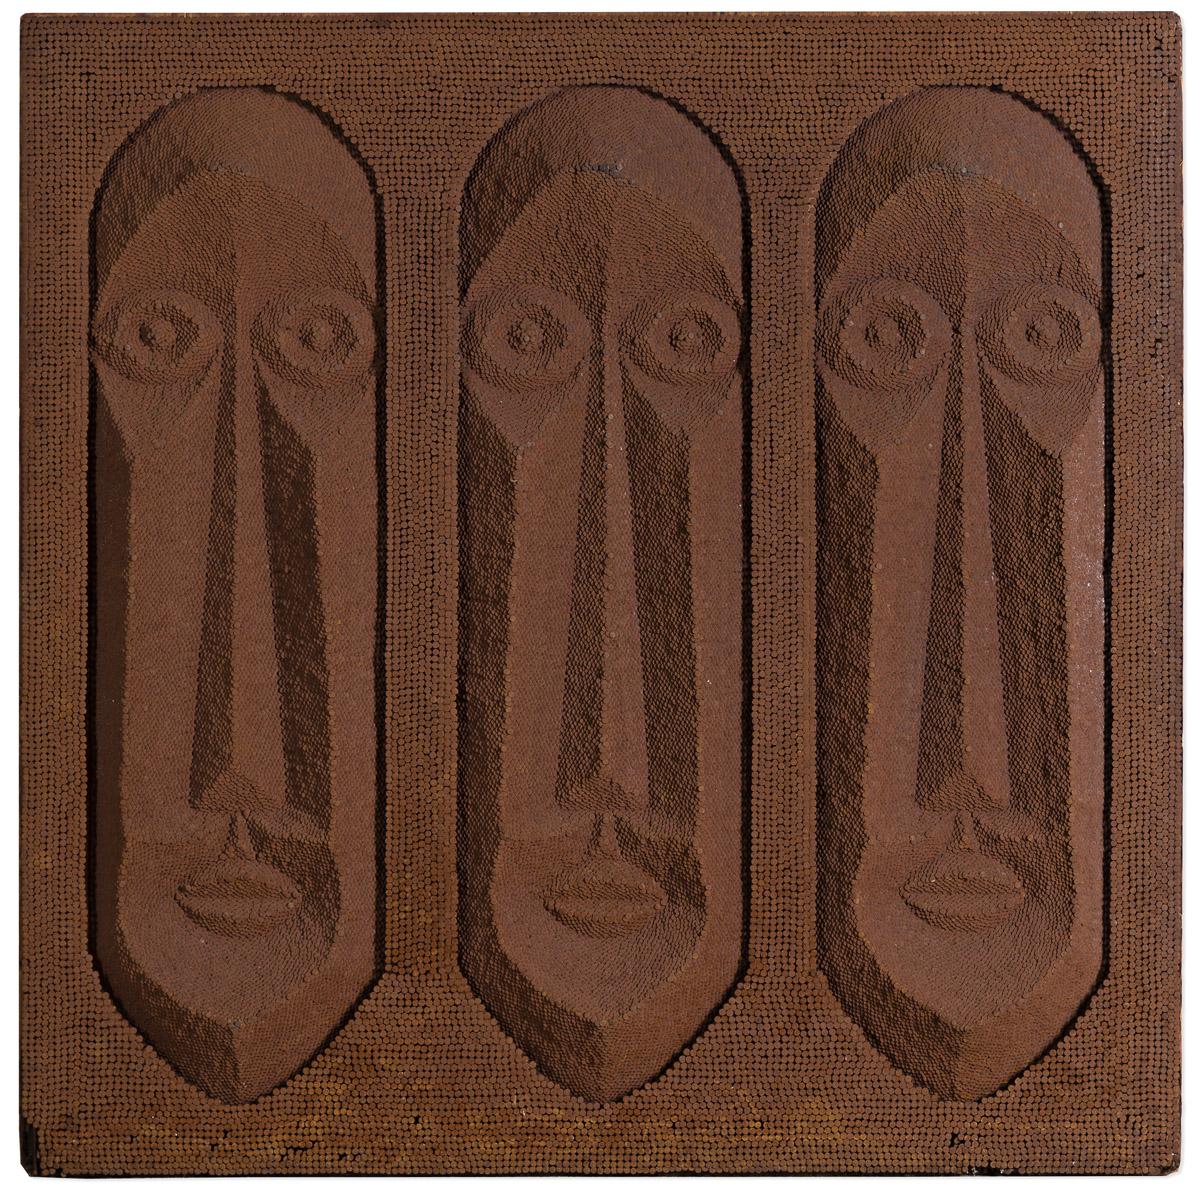 CARL RICHARD DINGBAT SMITH (1927 - 1980S) Three Brothers.